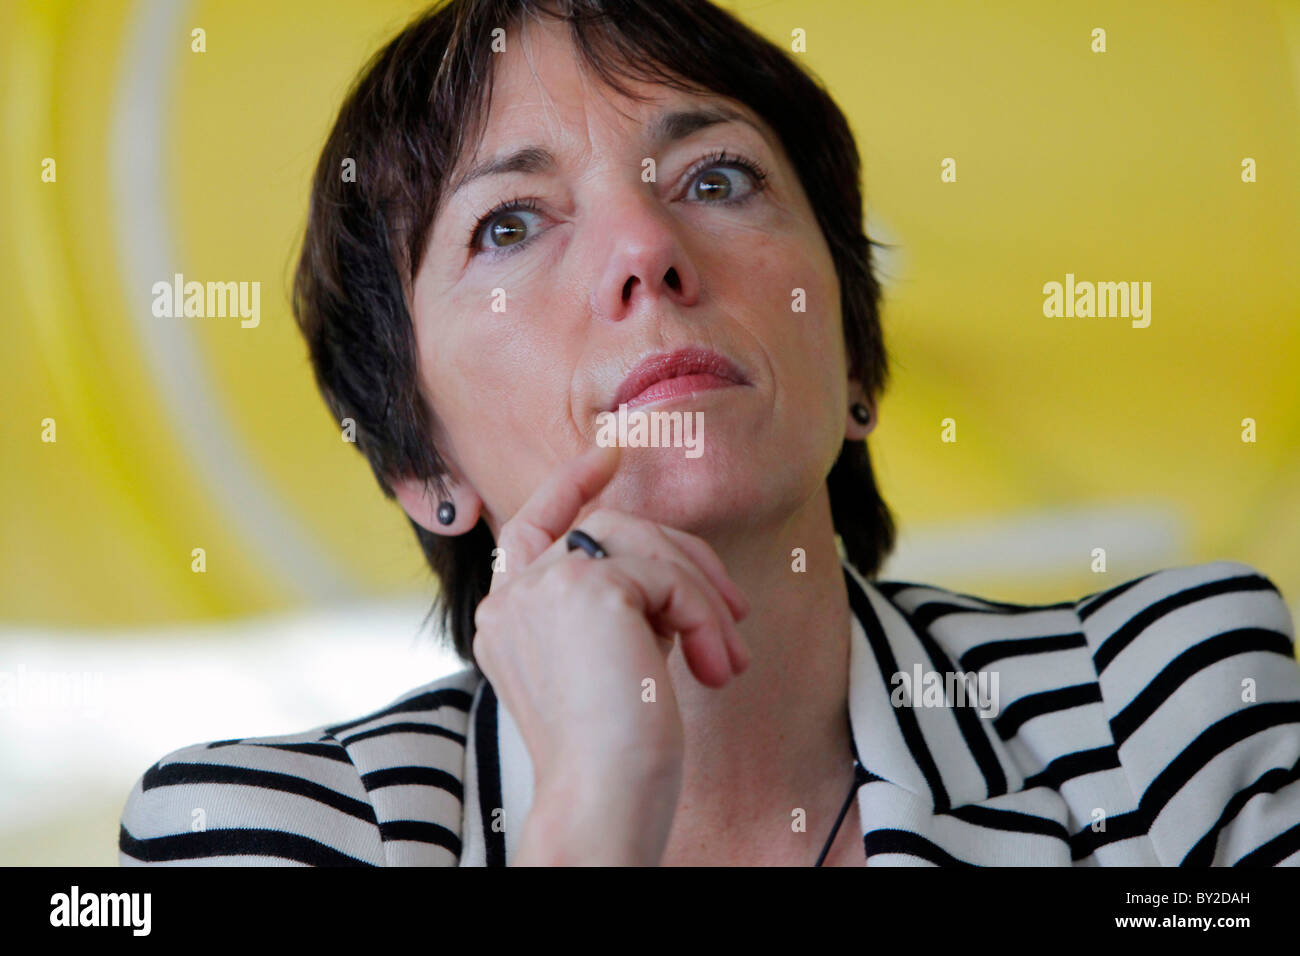 Prof. Dr. Margot Kaessmann Käßmann Ruhr University Stock Photo